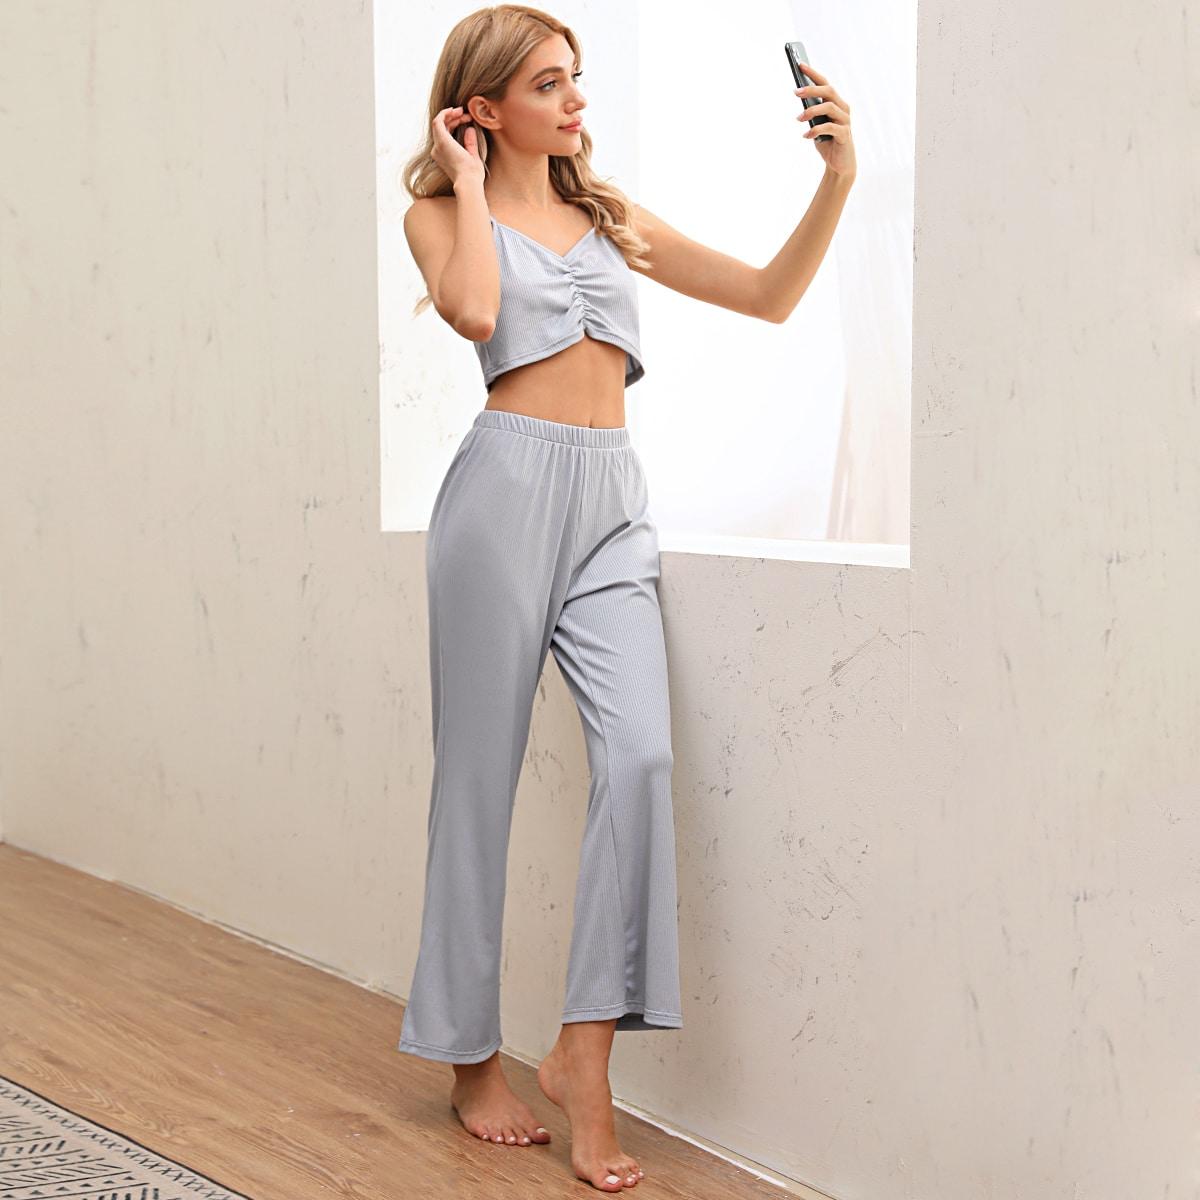 Вязаная пижама со складкой фото